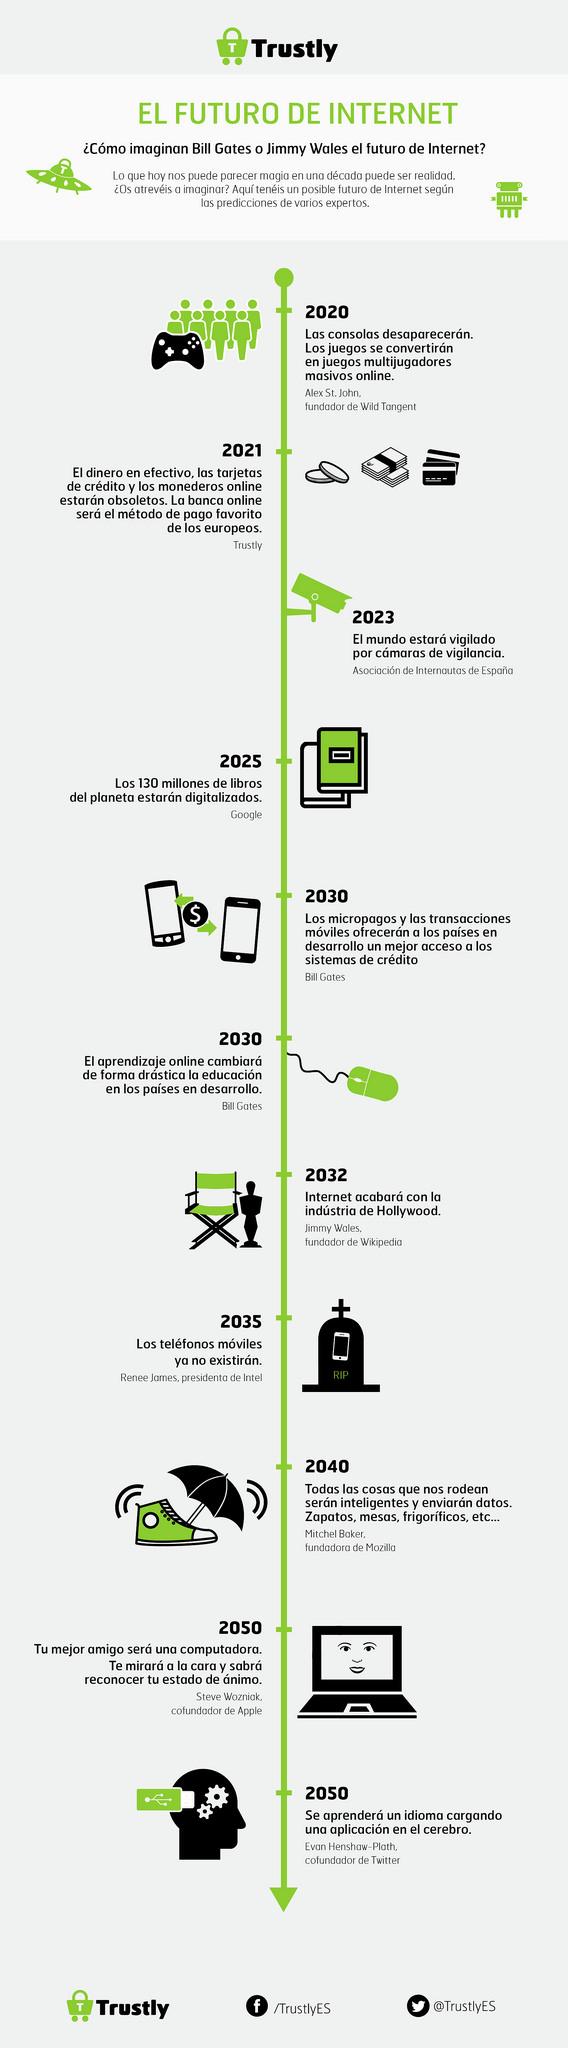 interneten2050